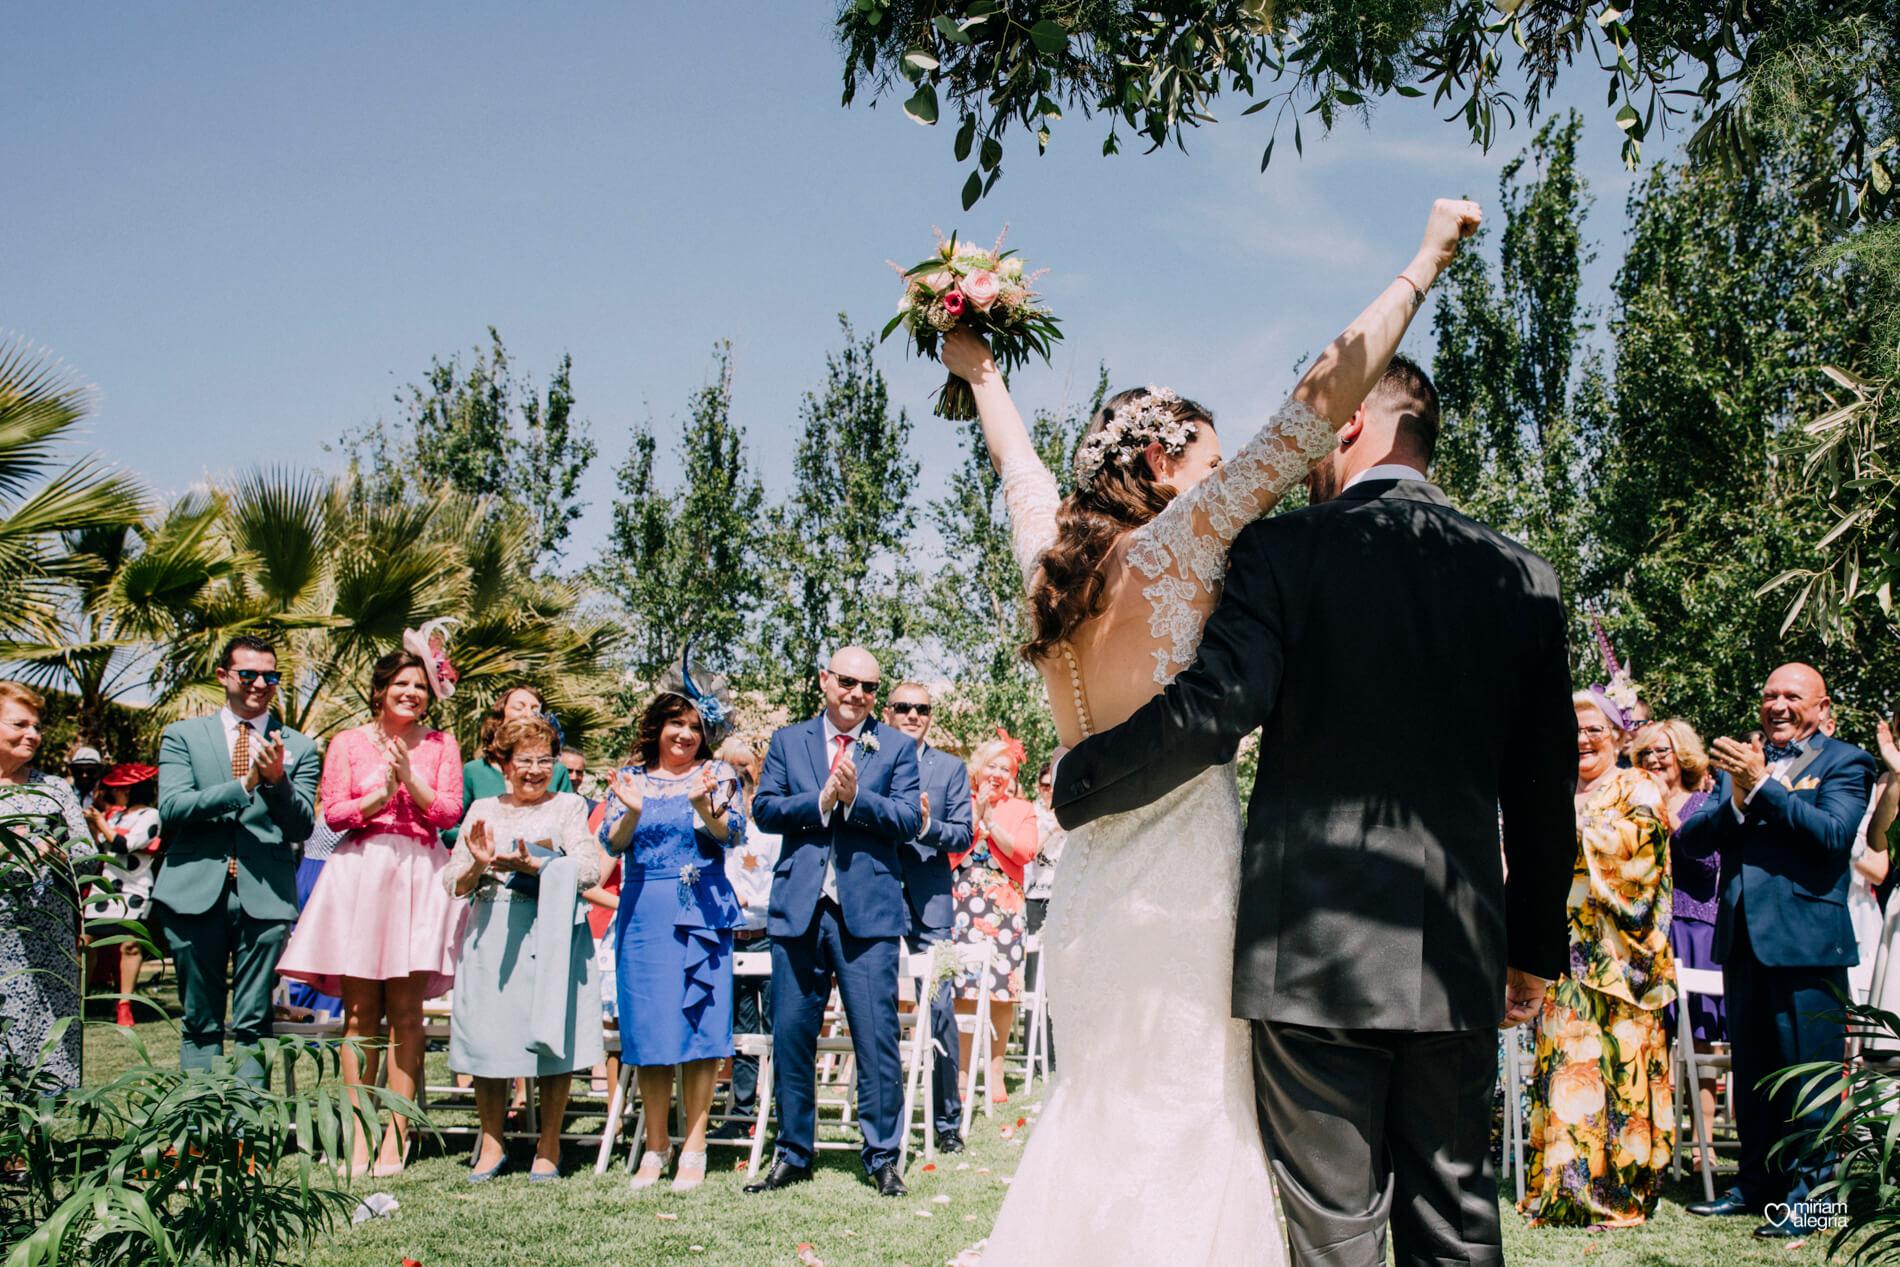 boda-en-finca-jurosa-miriam-alegria-74